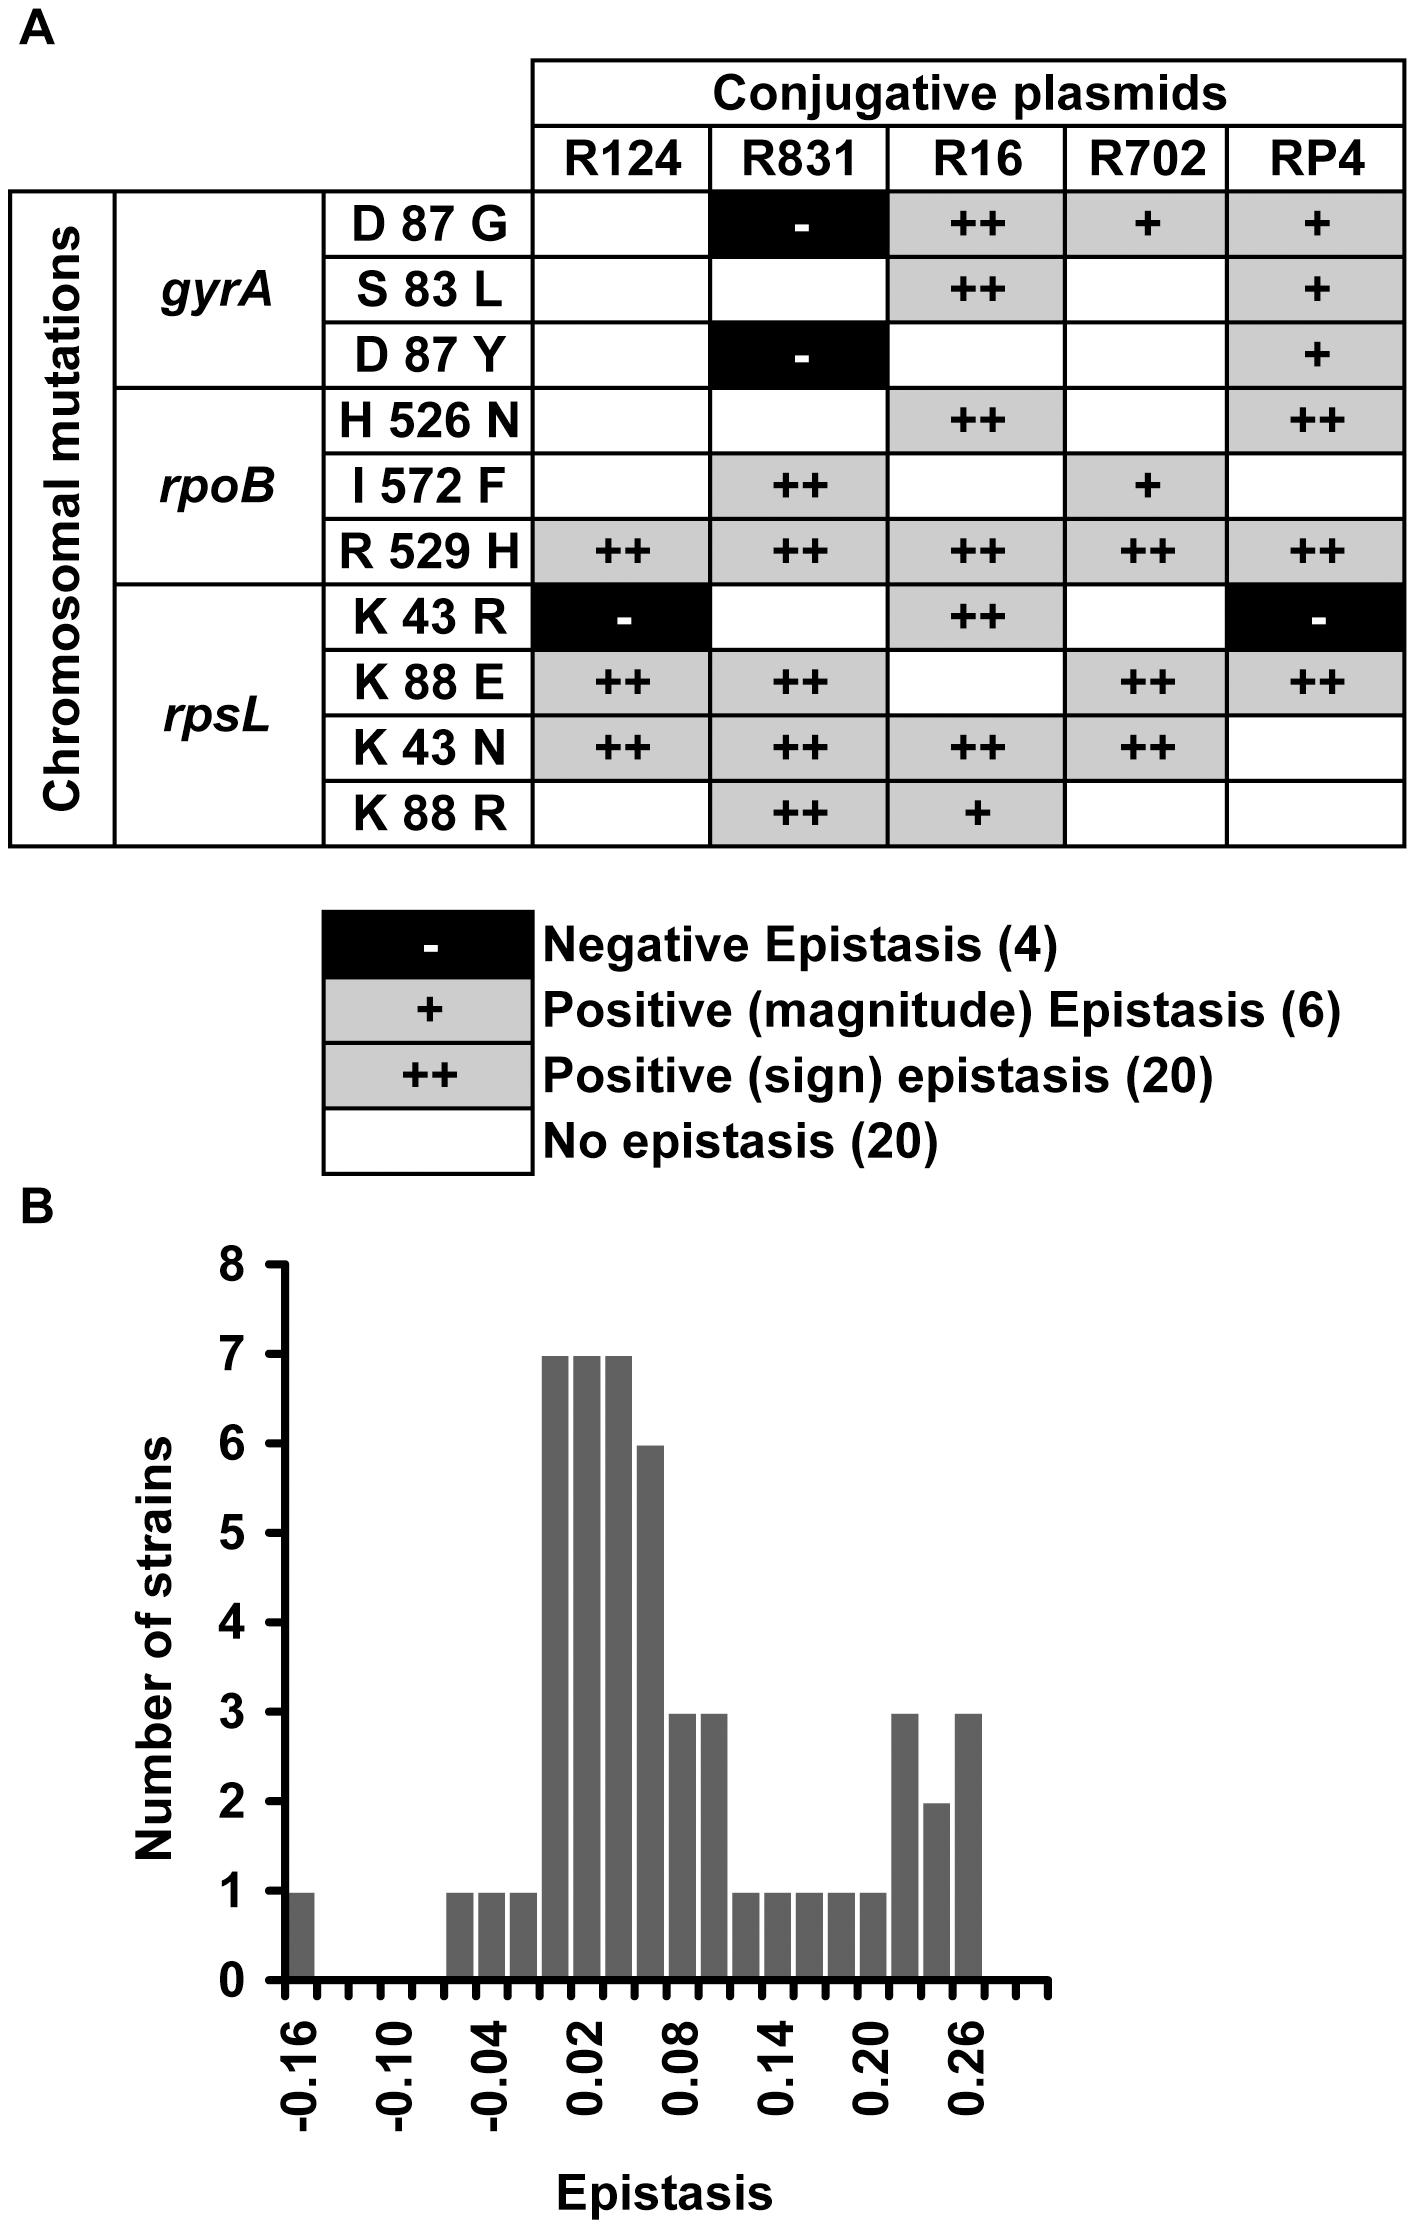 Epistasis between antibiotic resistance mutations and conjugative plasmids.